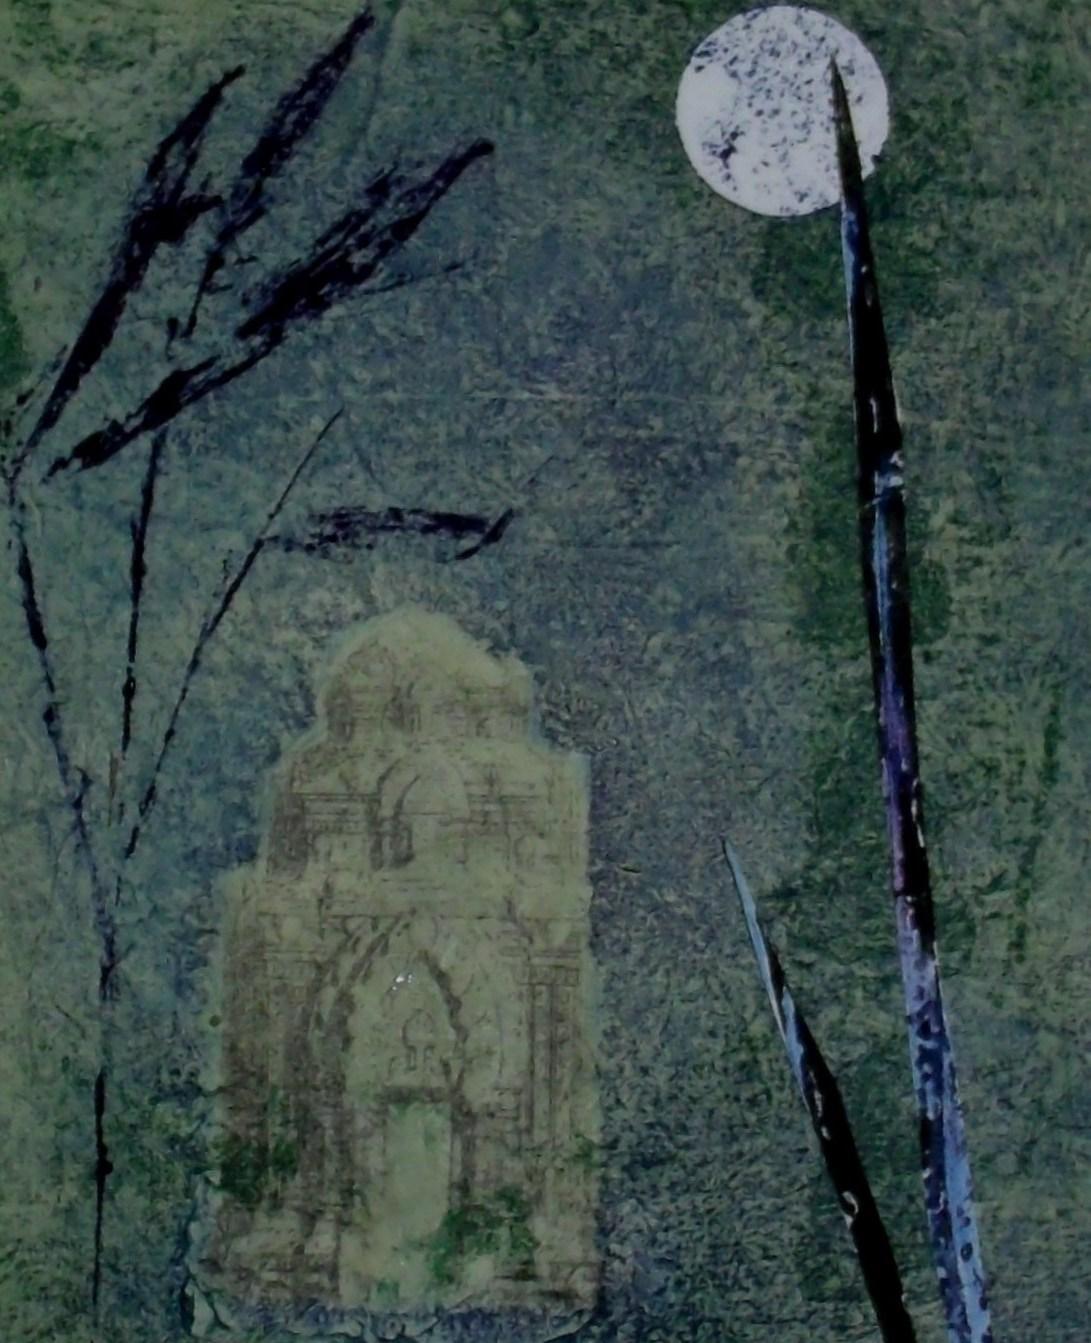 Cham and Moon, Dan Noyes